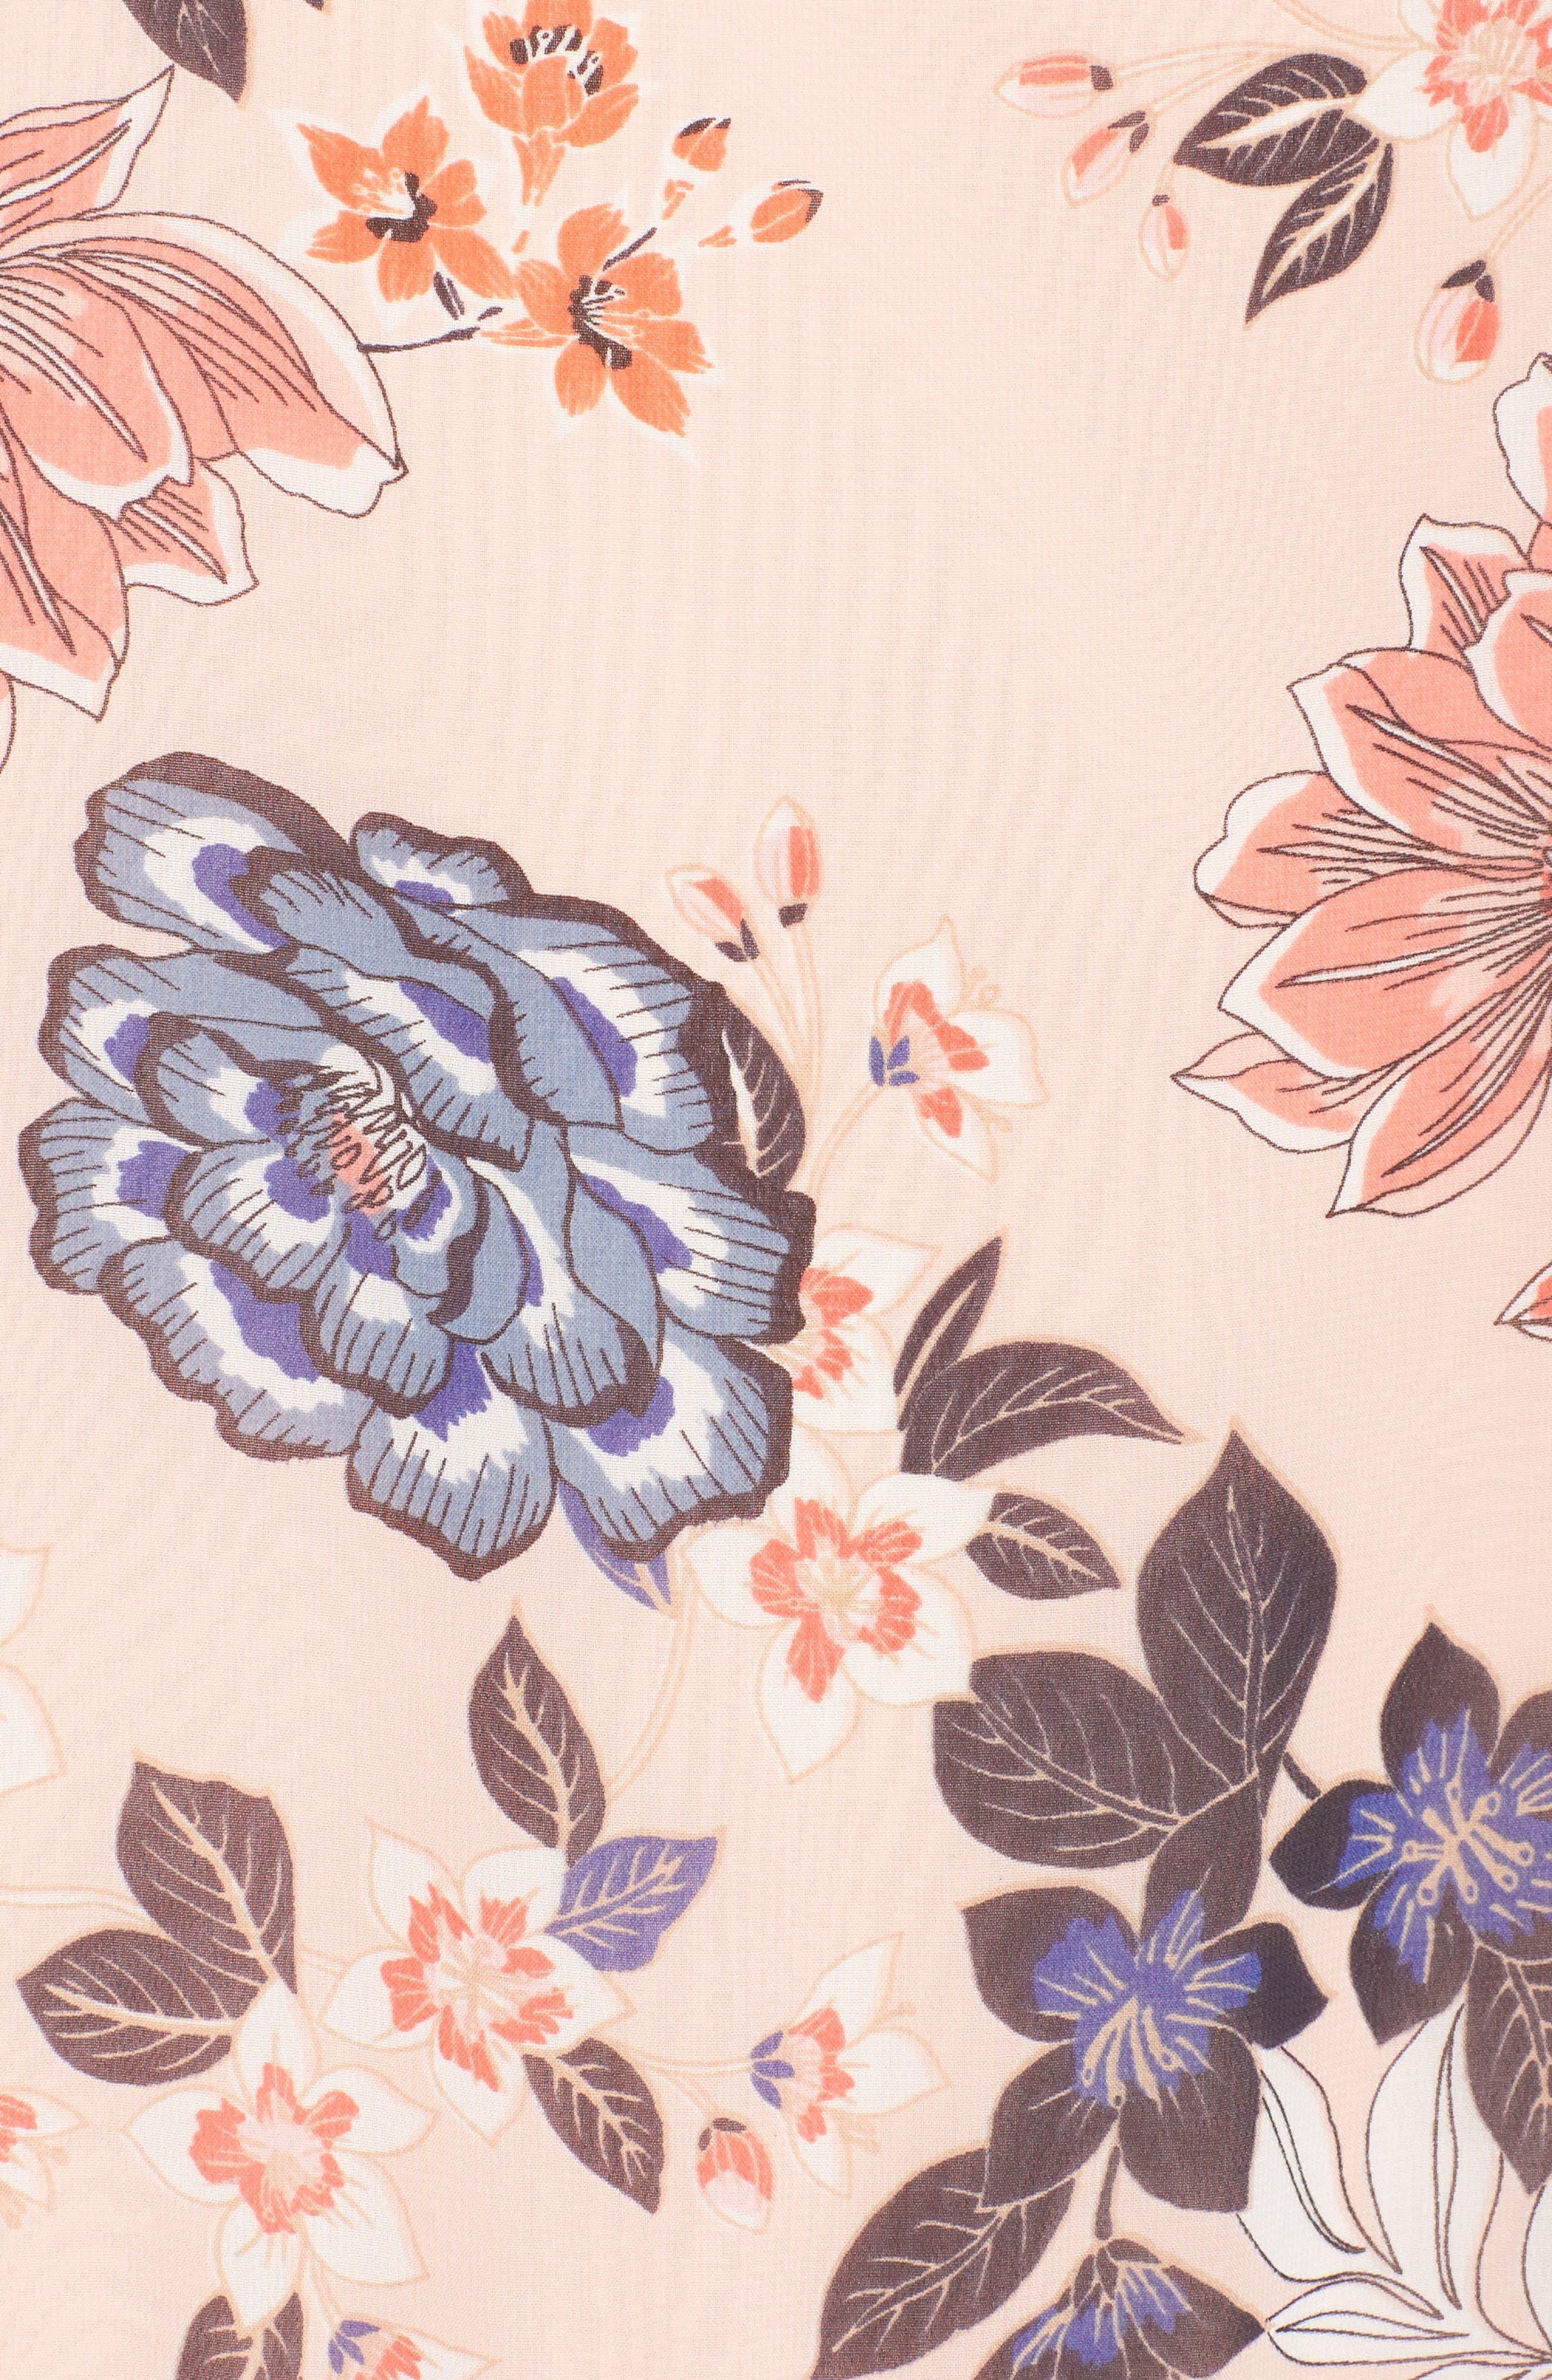 Floral Ruffle Neck Chiffon Shift Dress,                             Alternate thumbnail 6, color,                             BLUSH